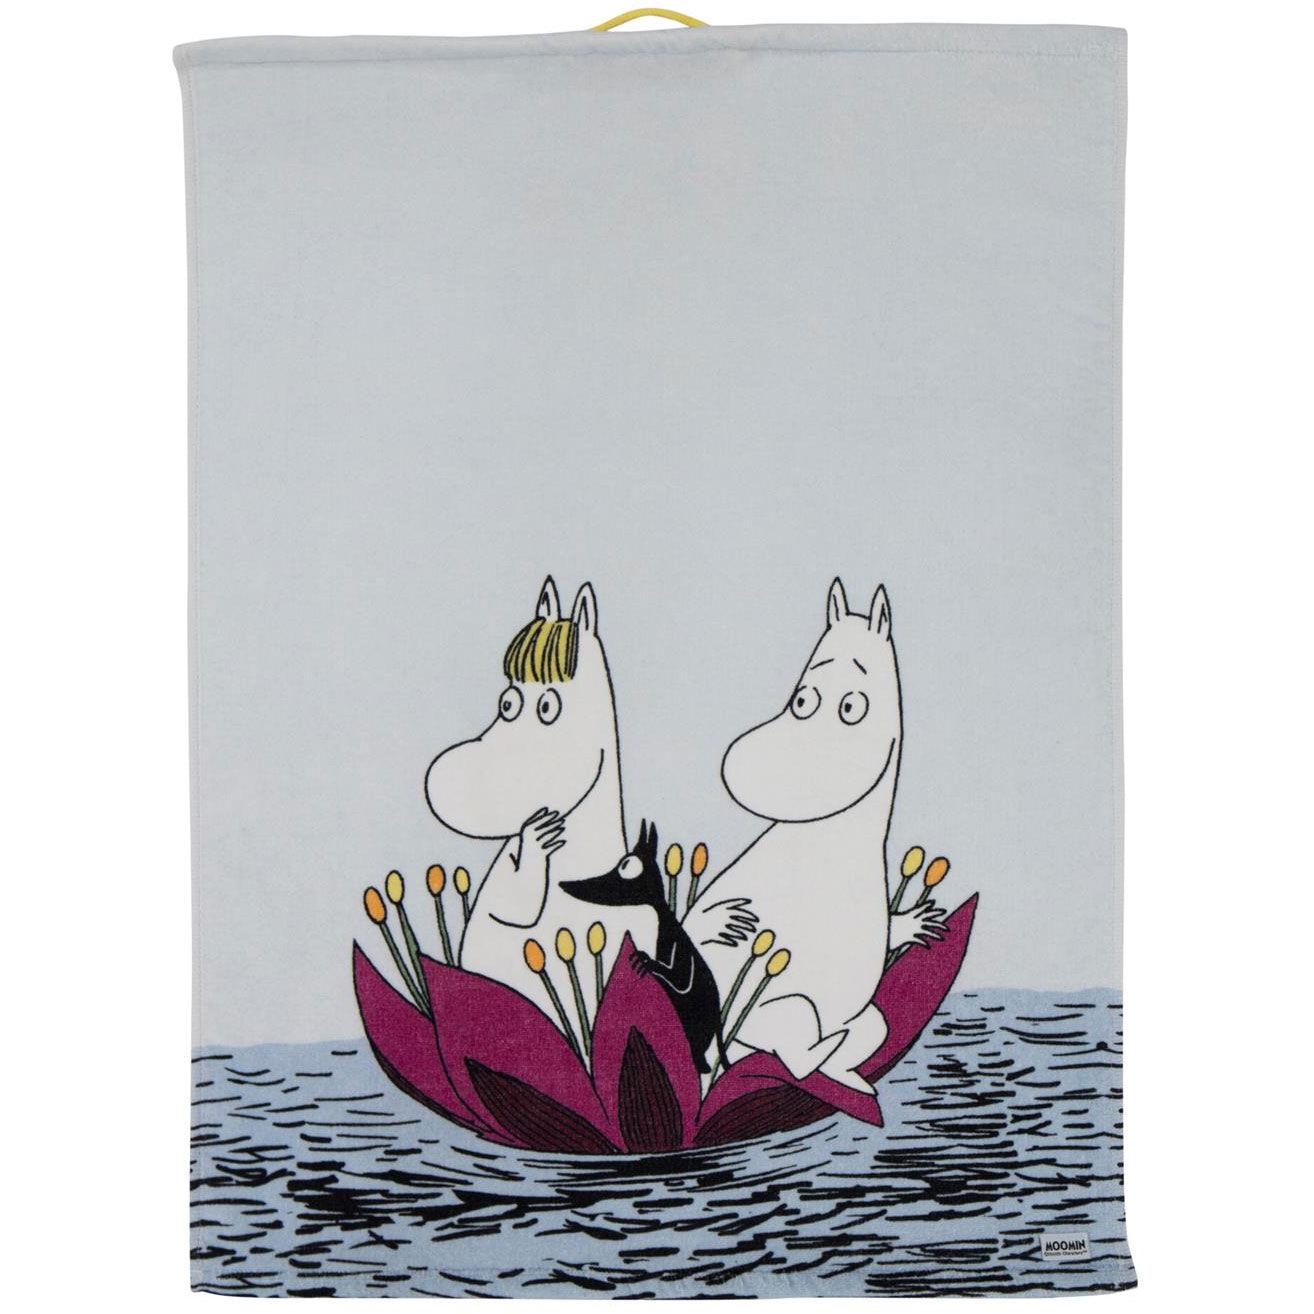 Moomin Moomin Towel 50x70 cm, Multi